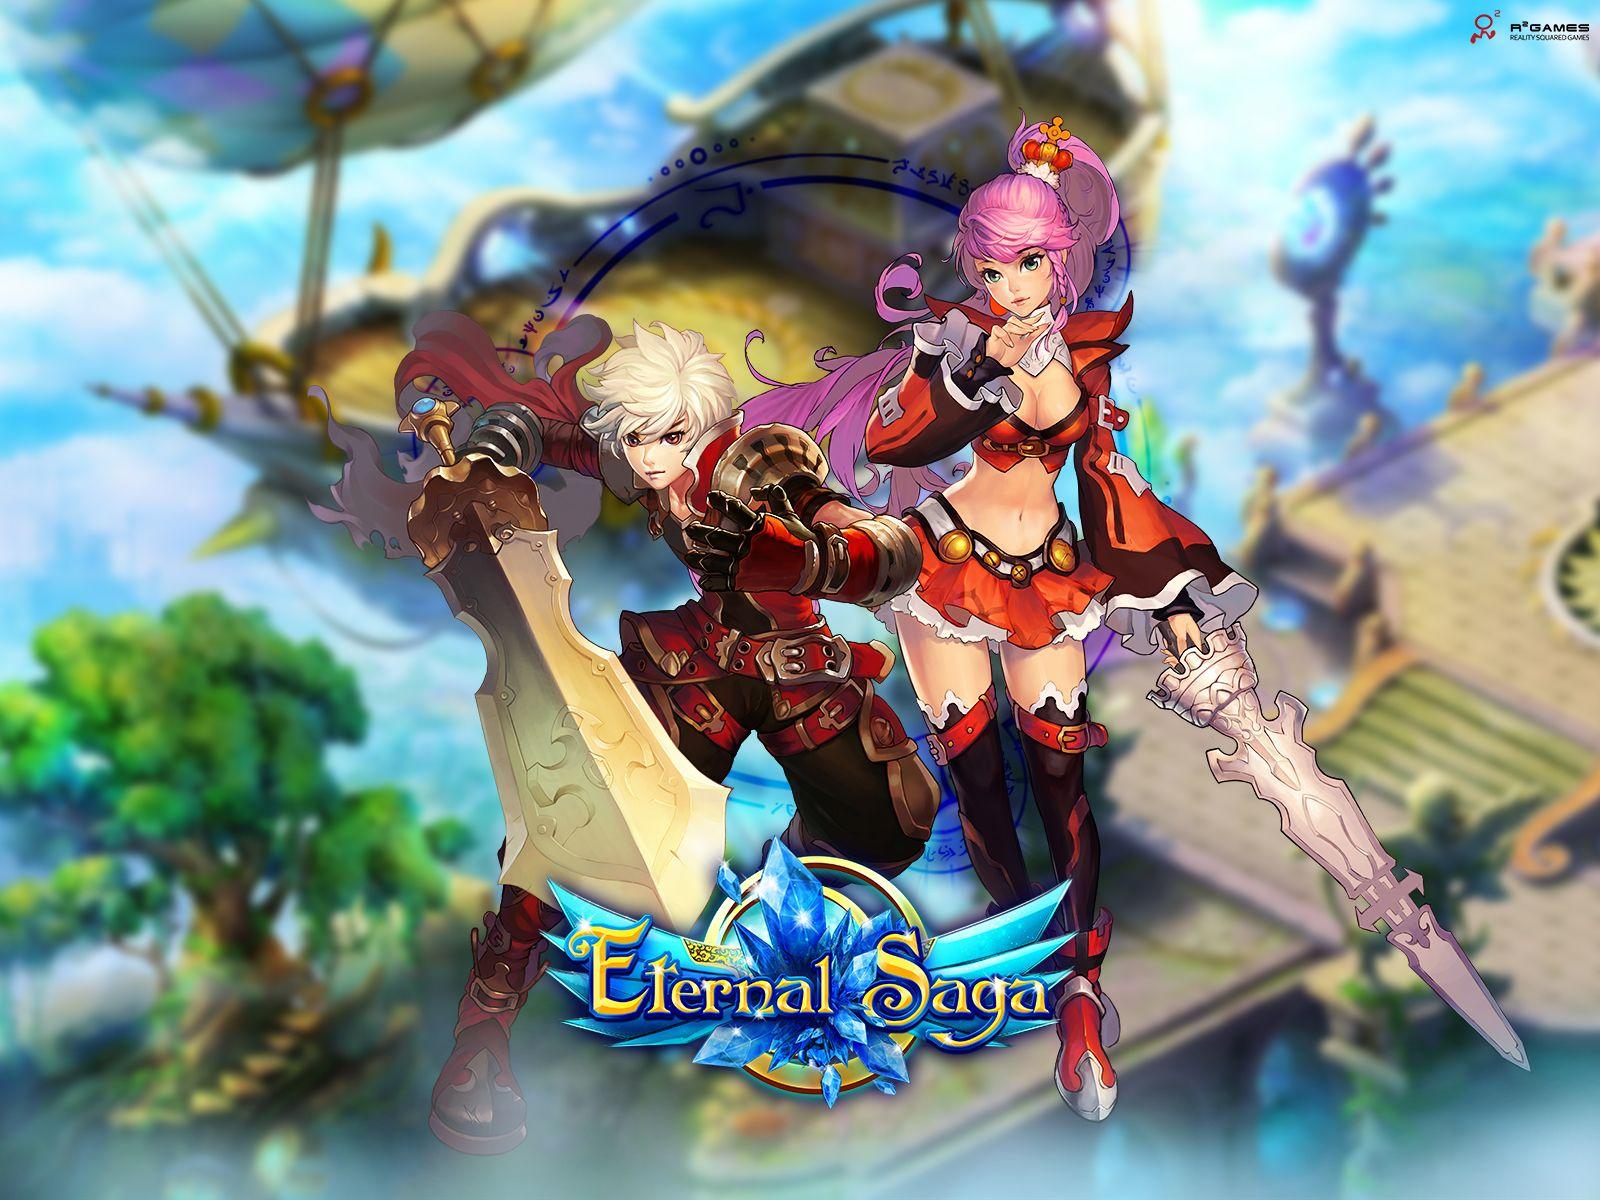 Eternal Saga free to play, storydriven fantasy MMORPG!